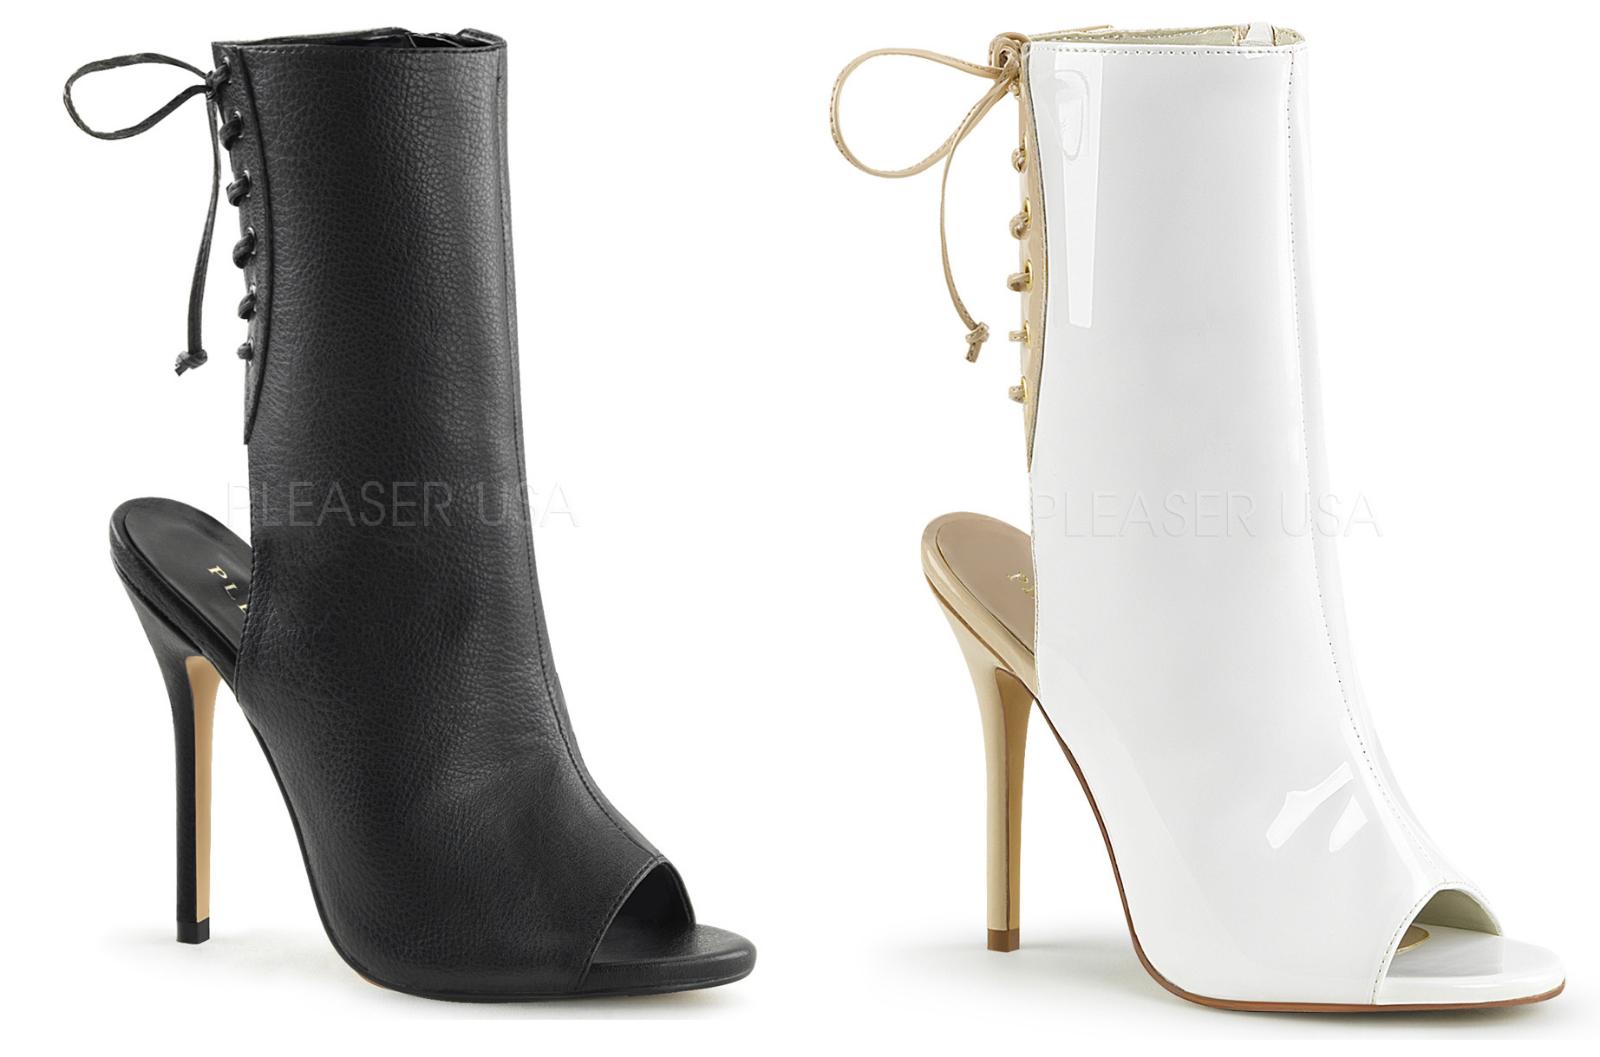 Pleaser AMUSE-1018 Open Toe Ankle Stiefel Größe 5-14